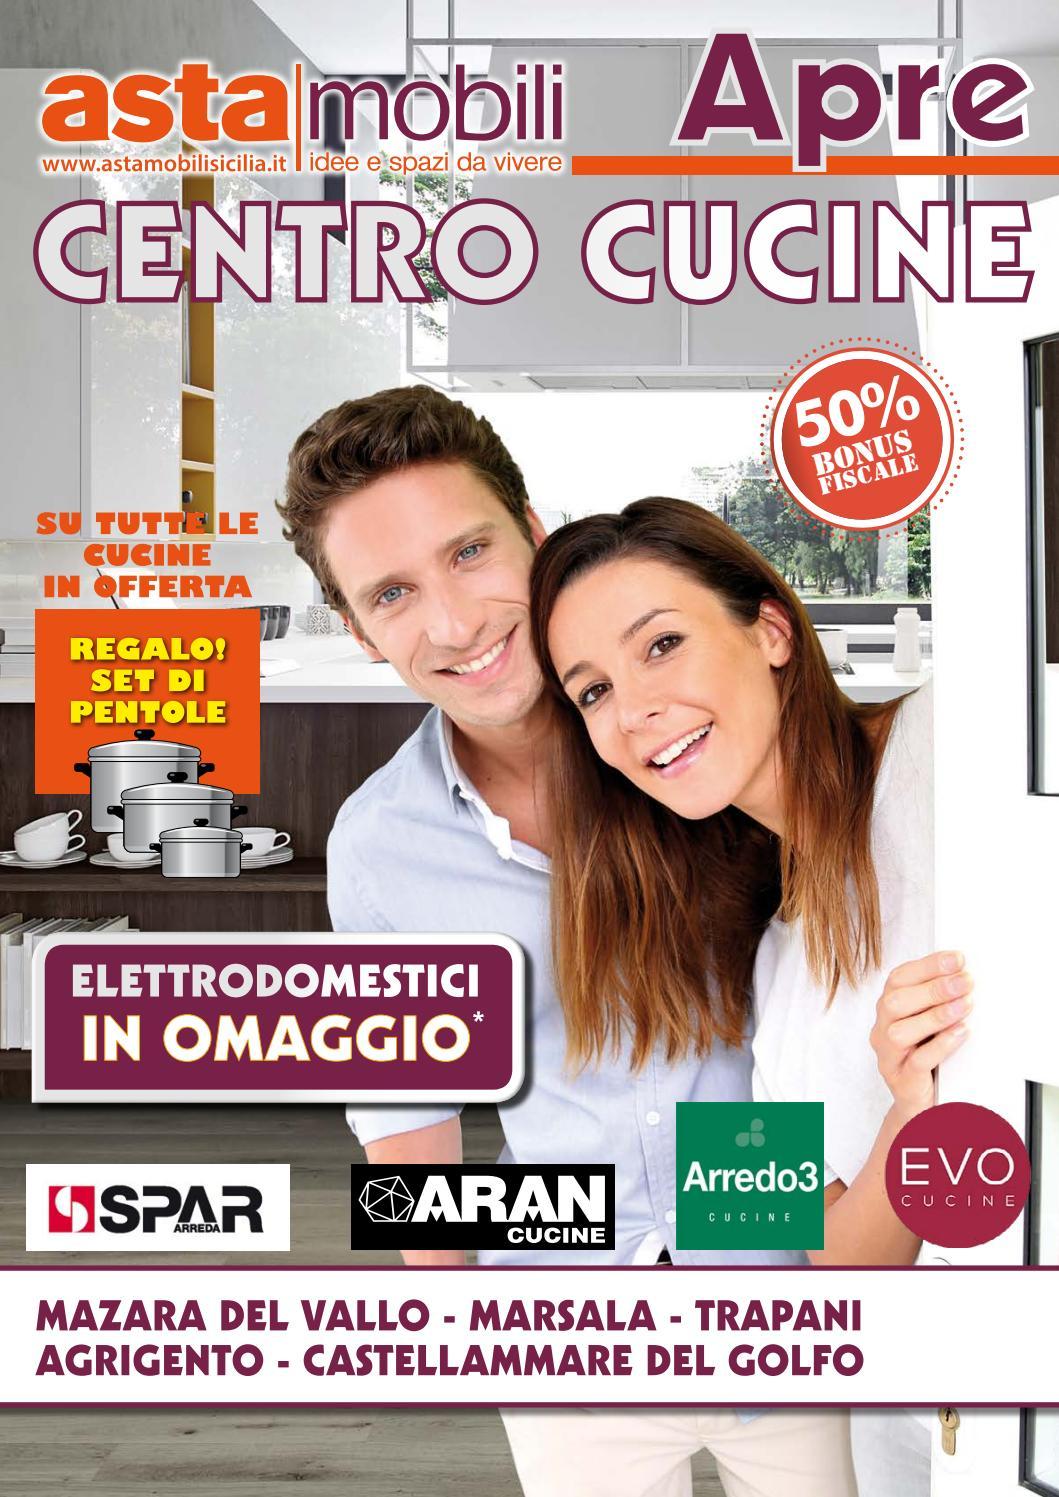 Apre Centro Cucine - Asta Mobili by Asta Mobili Sicilia - issuu